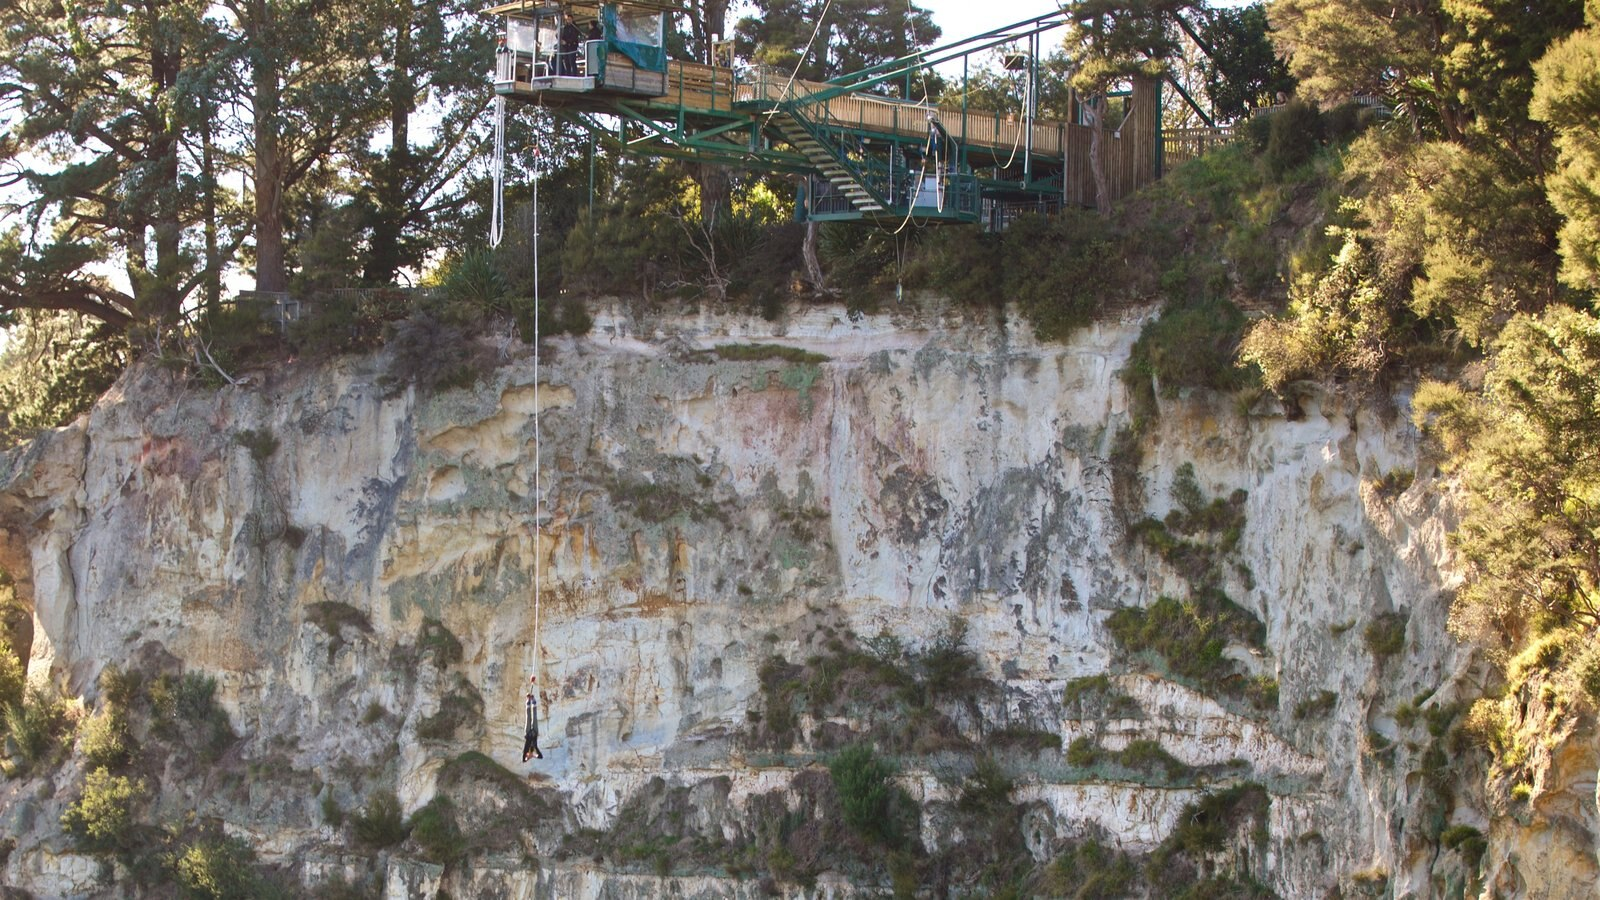 Taupo Bungy mostrando bungee jump e um desfiladeiro ou canyon